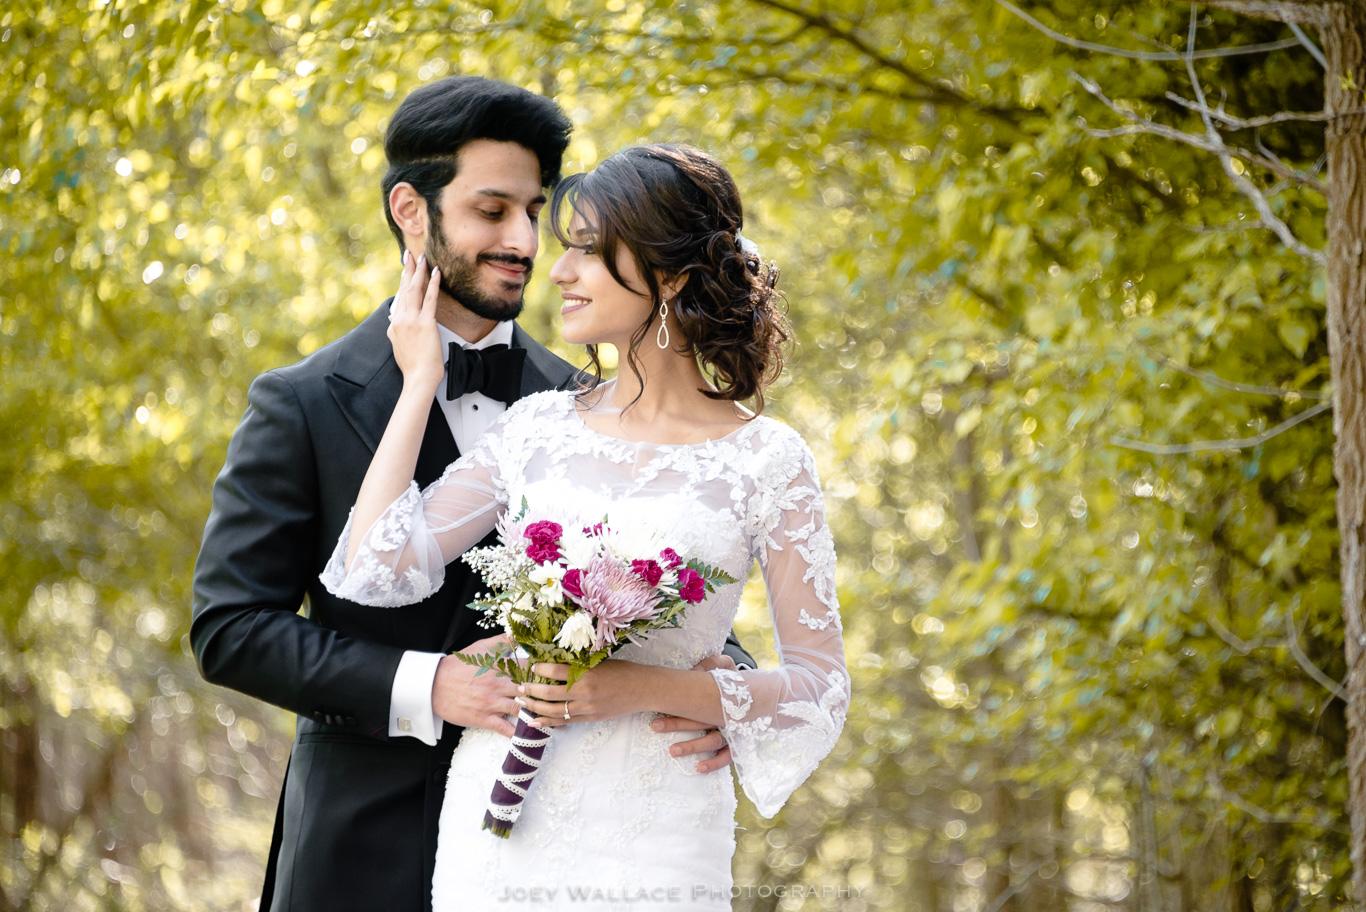 South Asian Wedding Photo Session in Atlanta